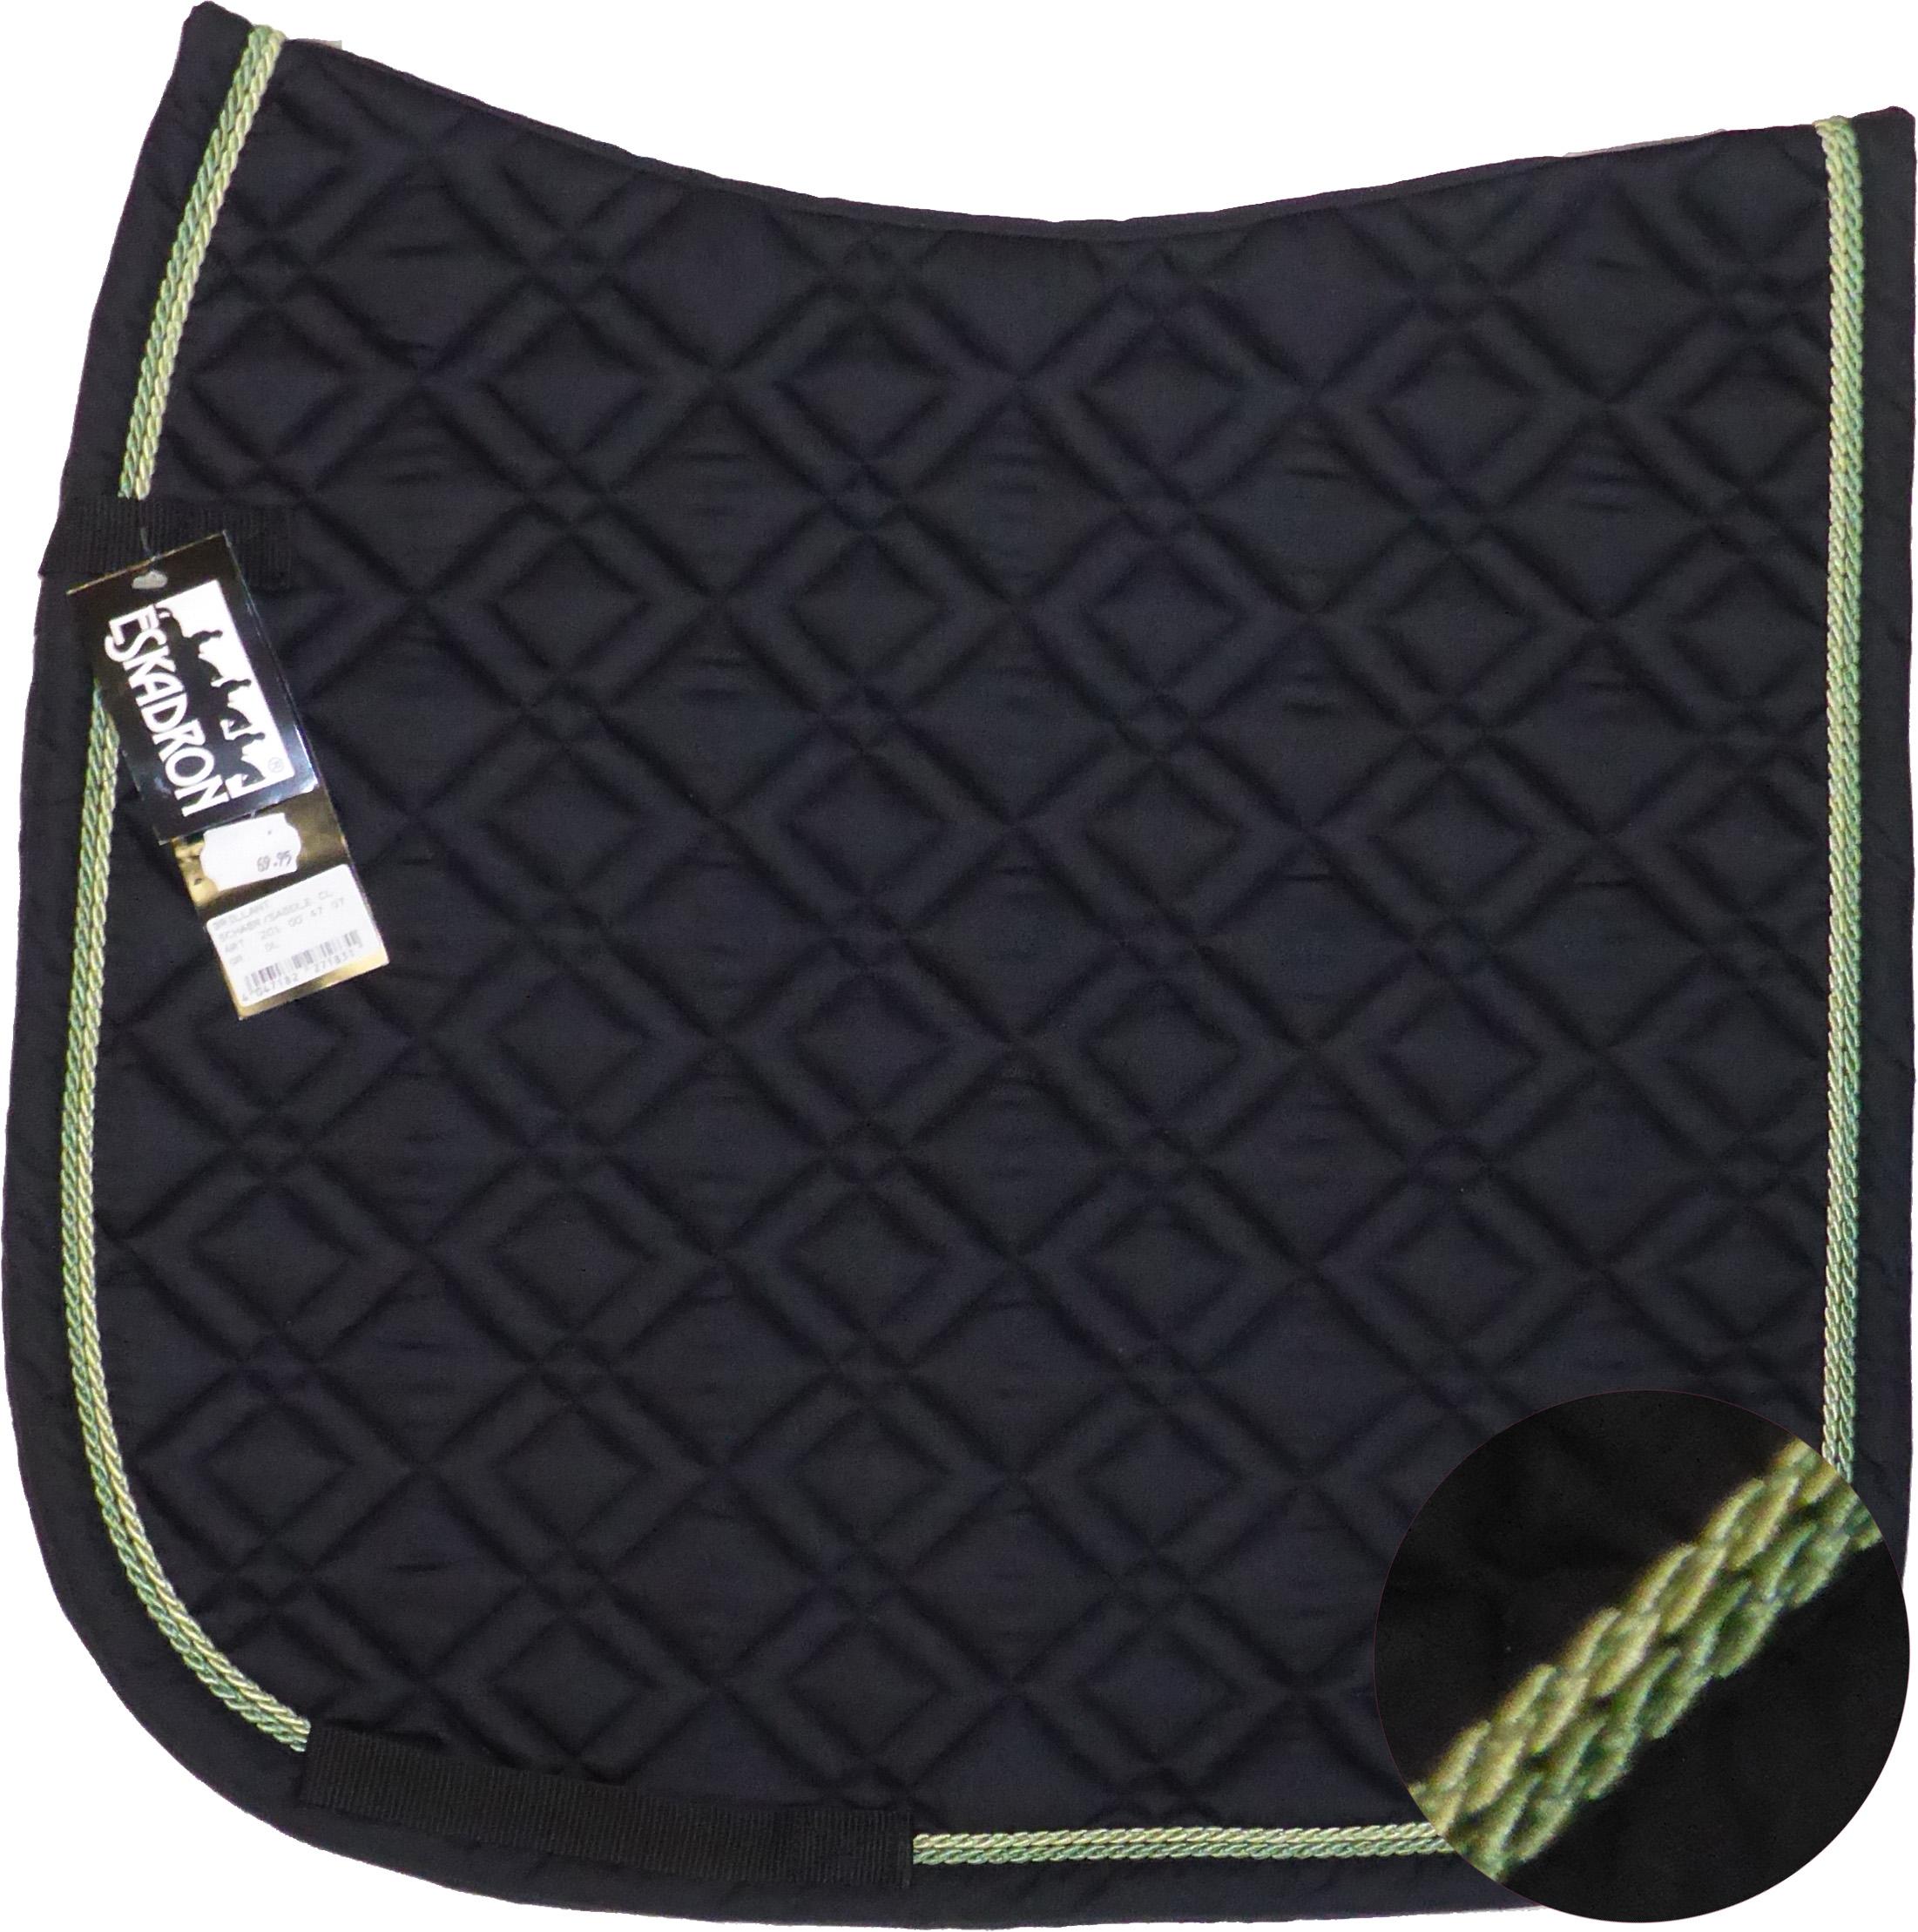 ESKADRON Brillant Schabracke black, 2fach Kordel lind/lightgreen